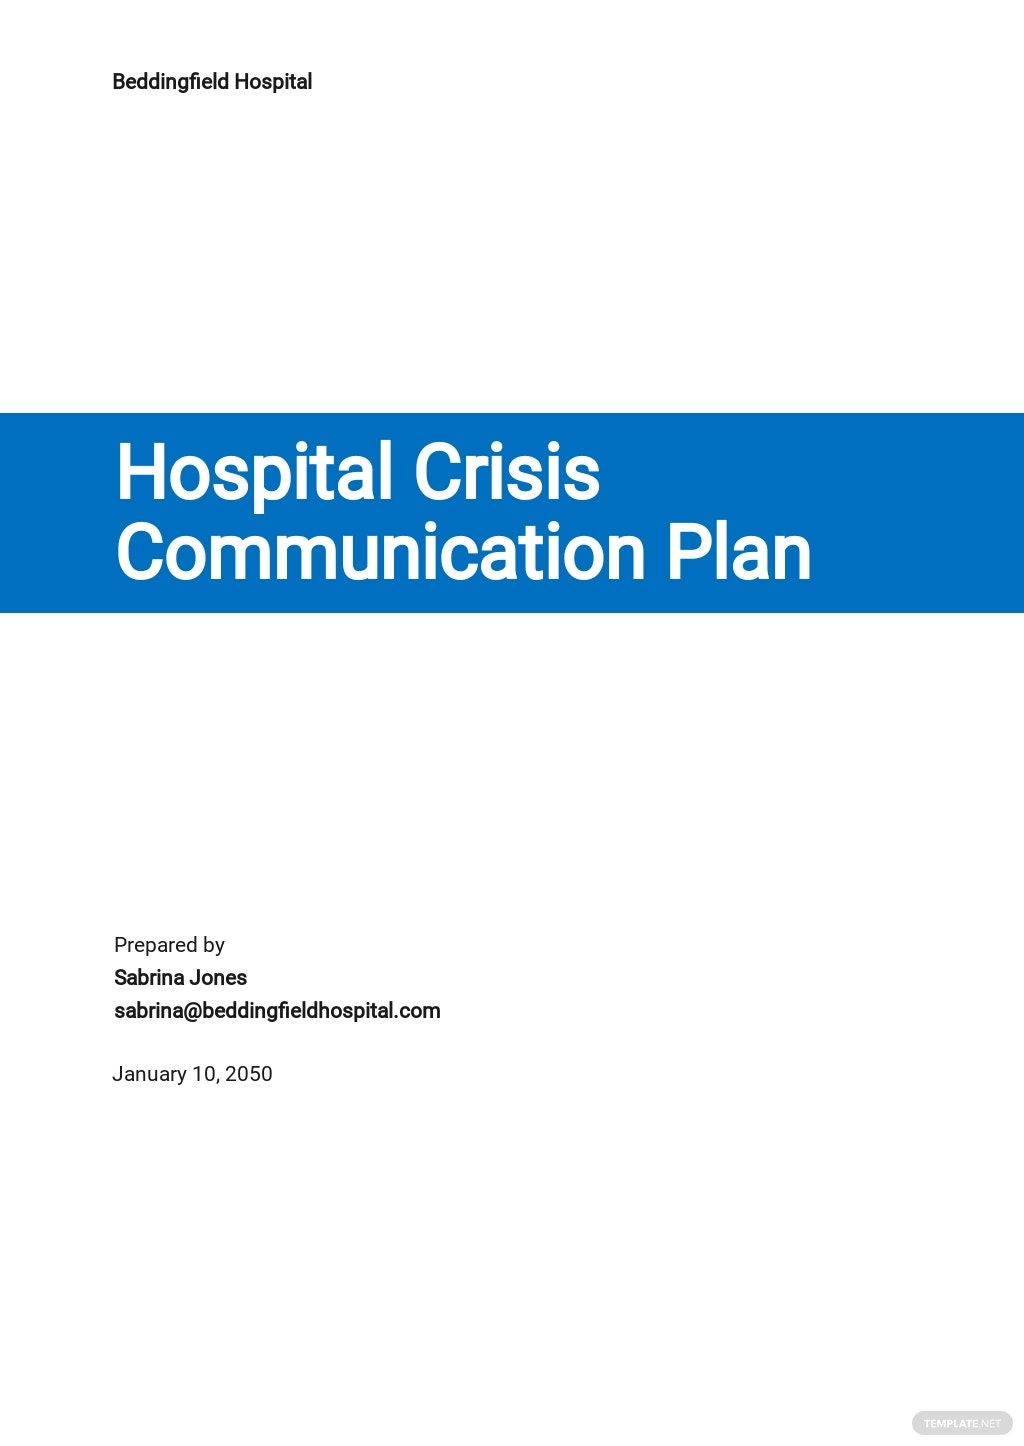 Hospital Crisis Communication Plan Template.jpe